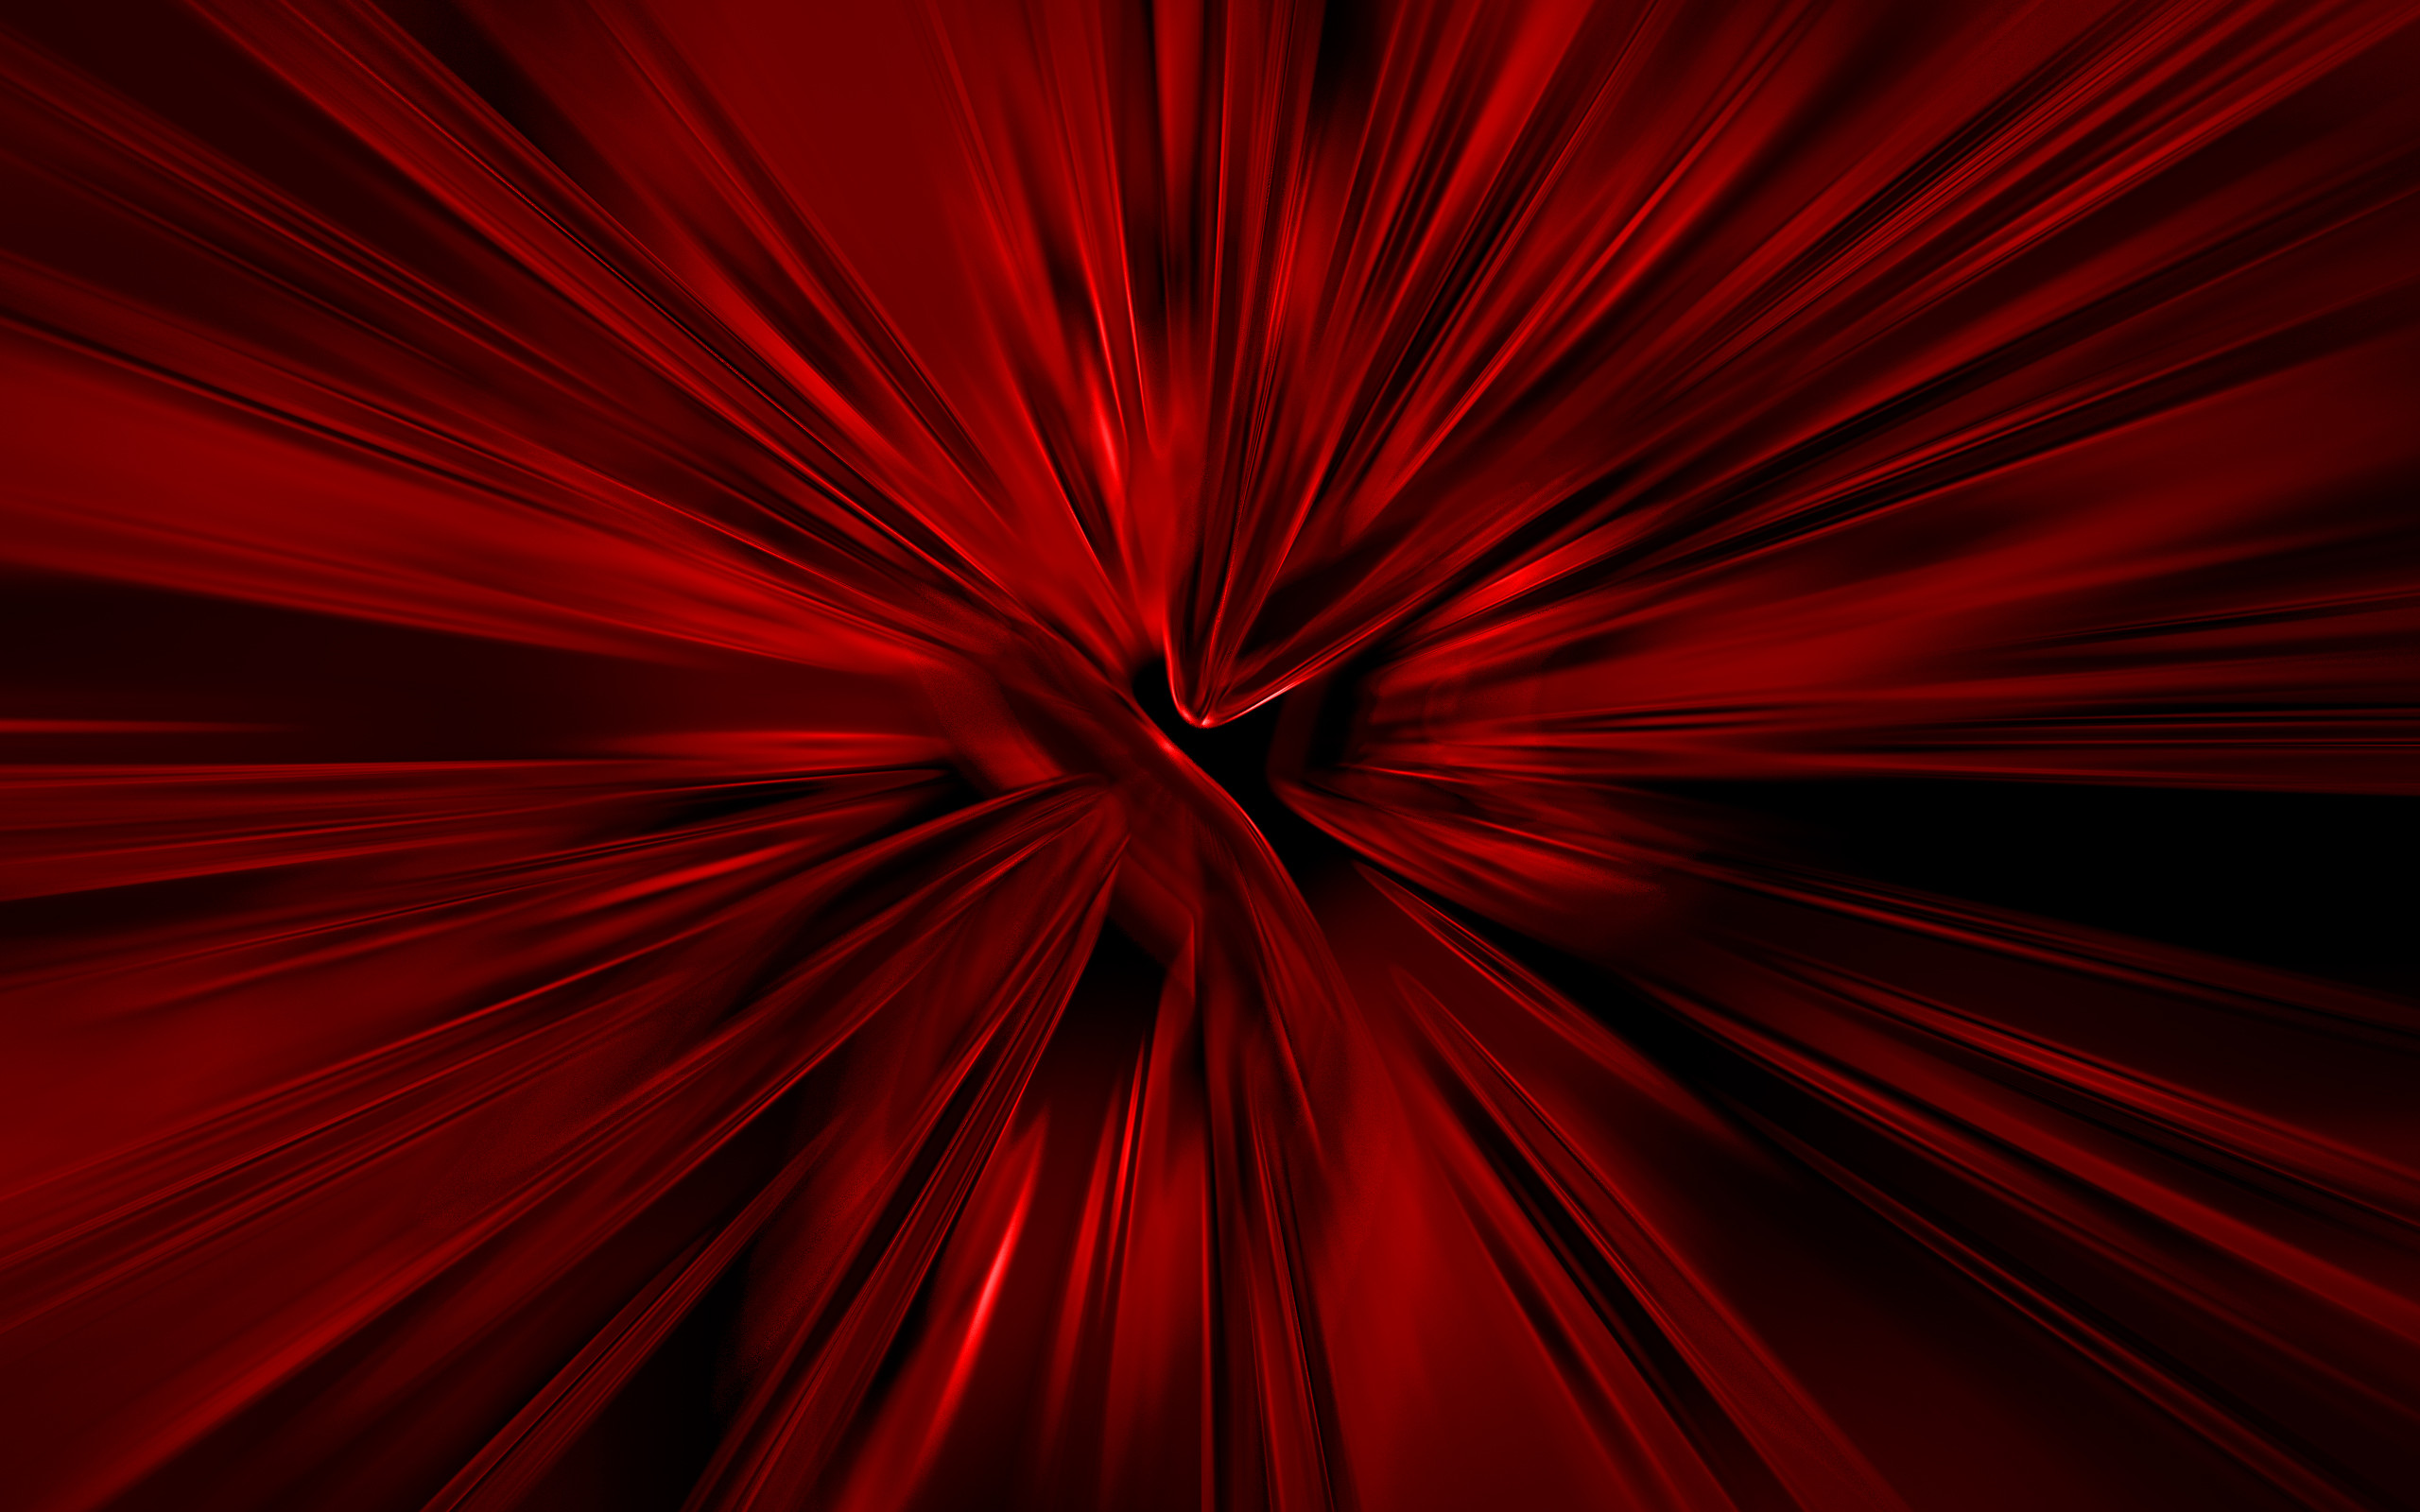 Red desktop background 75 images 1920x1200 alienware desktop background red organic design 1920x1200 voltagebd Choice Image